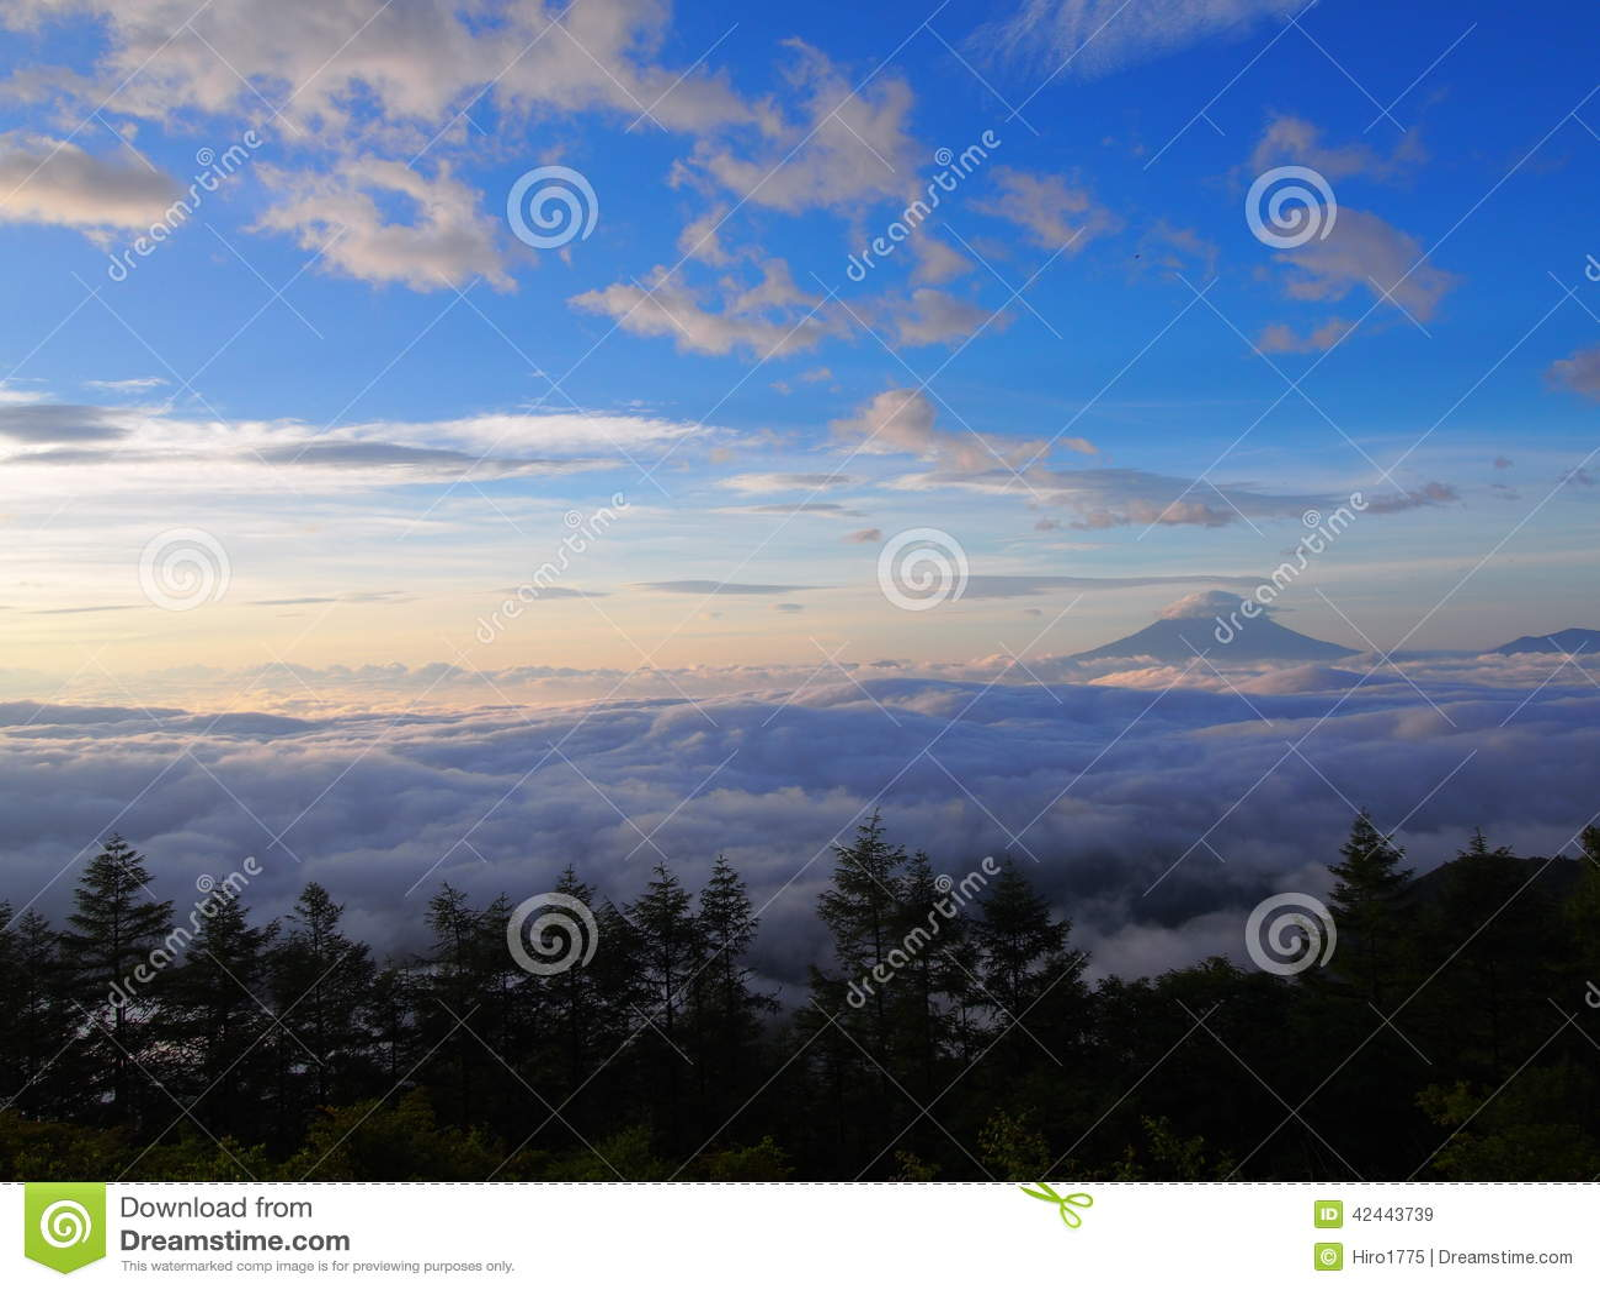 Mar de nubes y del Mt fuji